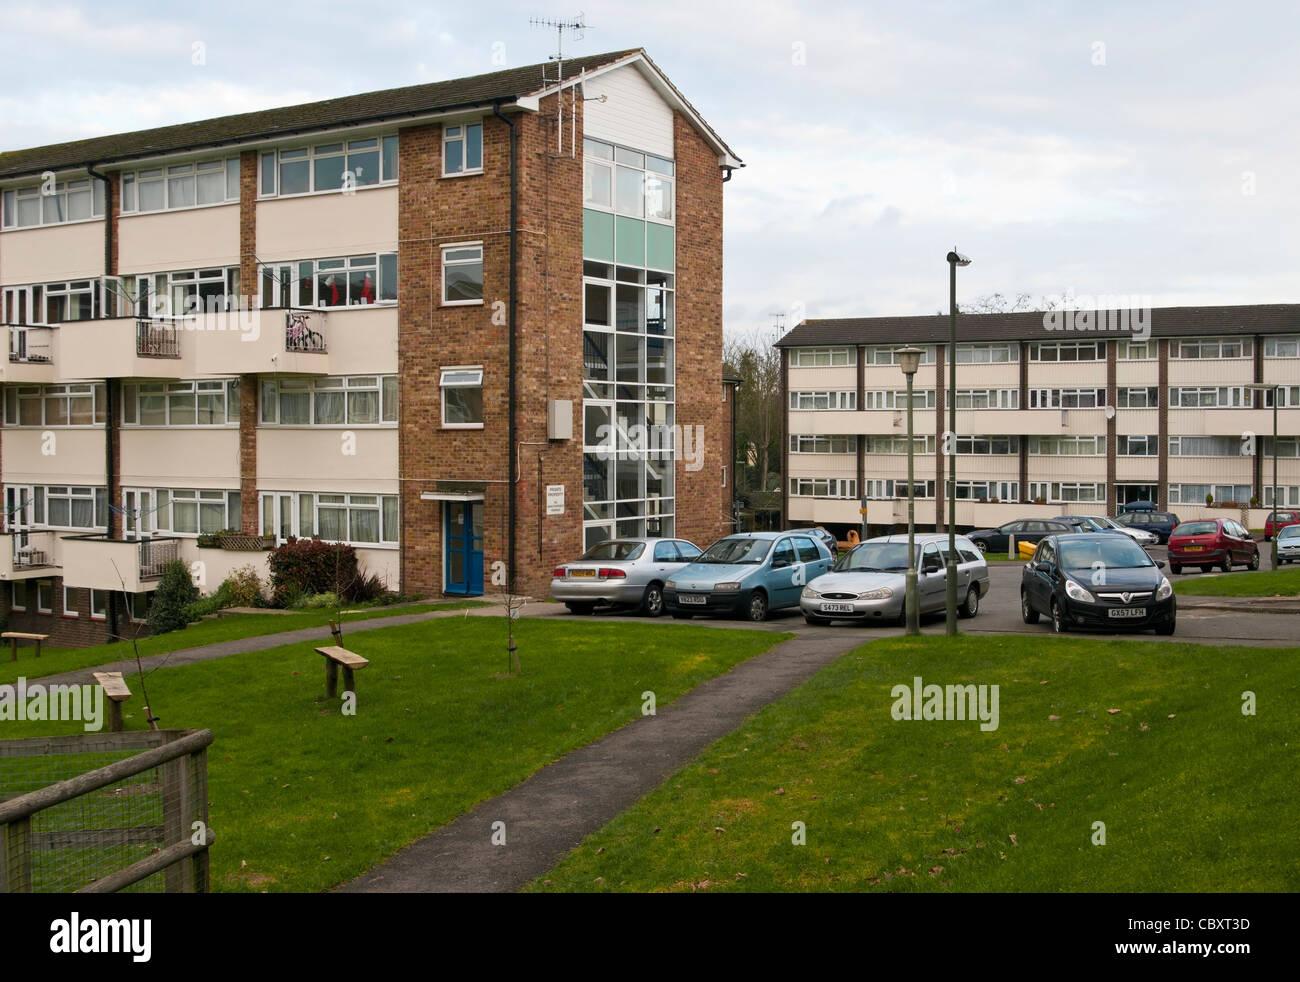 UK Residential council Housing Estate Estates With Blocks Of Maisonettes Flats - Stock Image